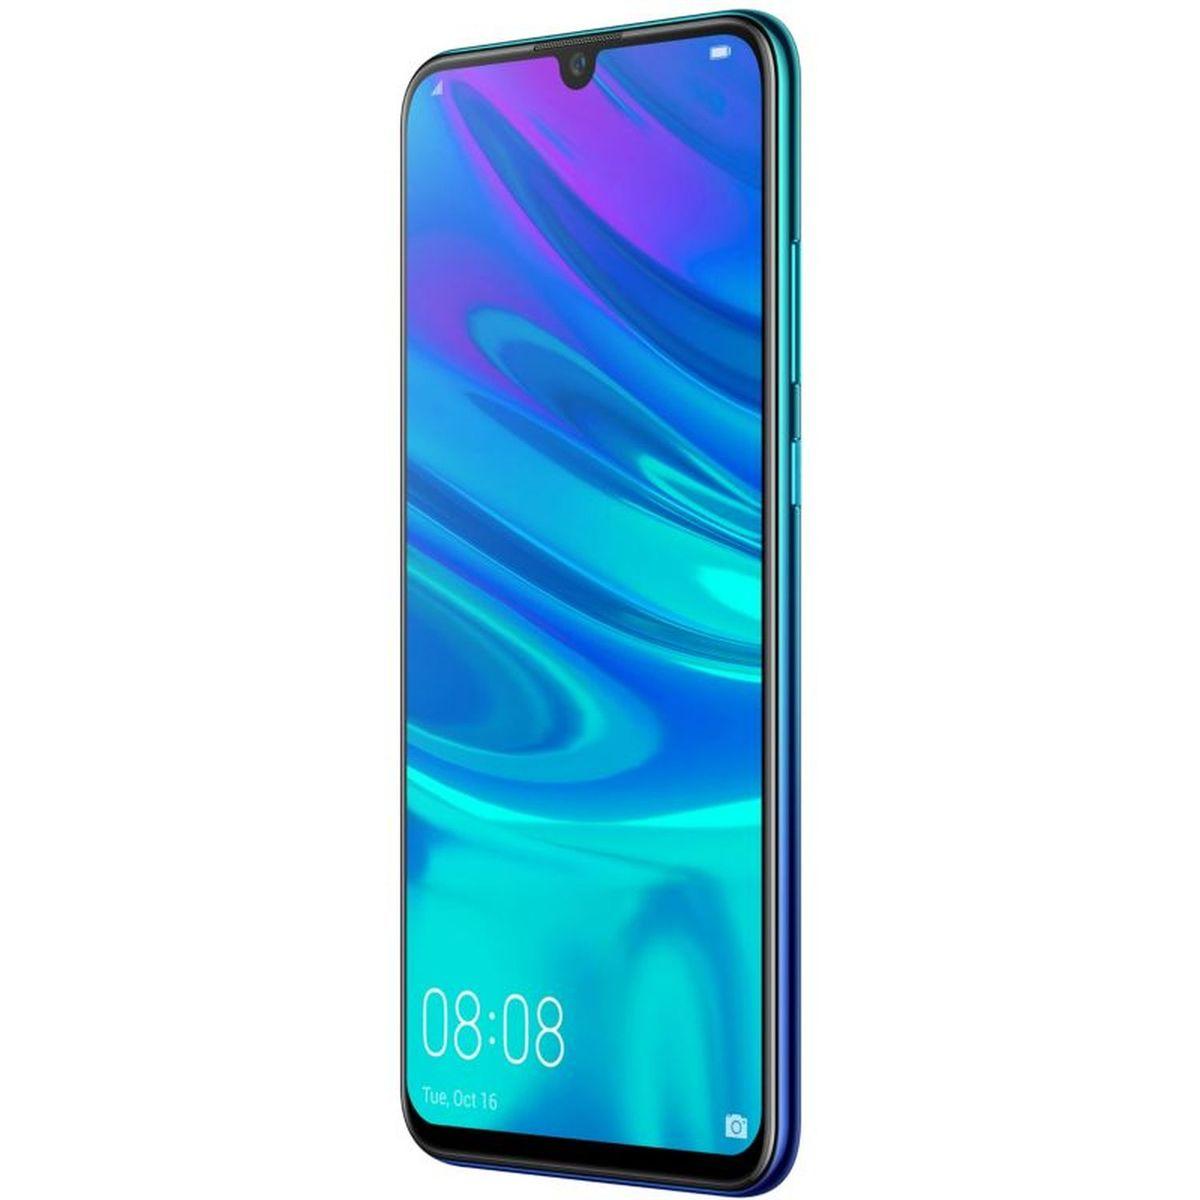 HUAWEI Smartphone - P Smart 2019 - 64 Go - 6.2 pouces - Bleu